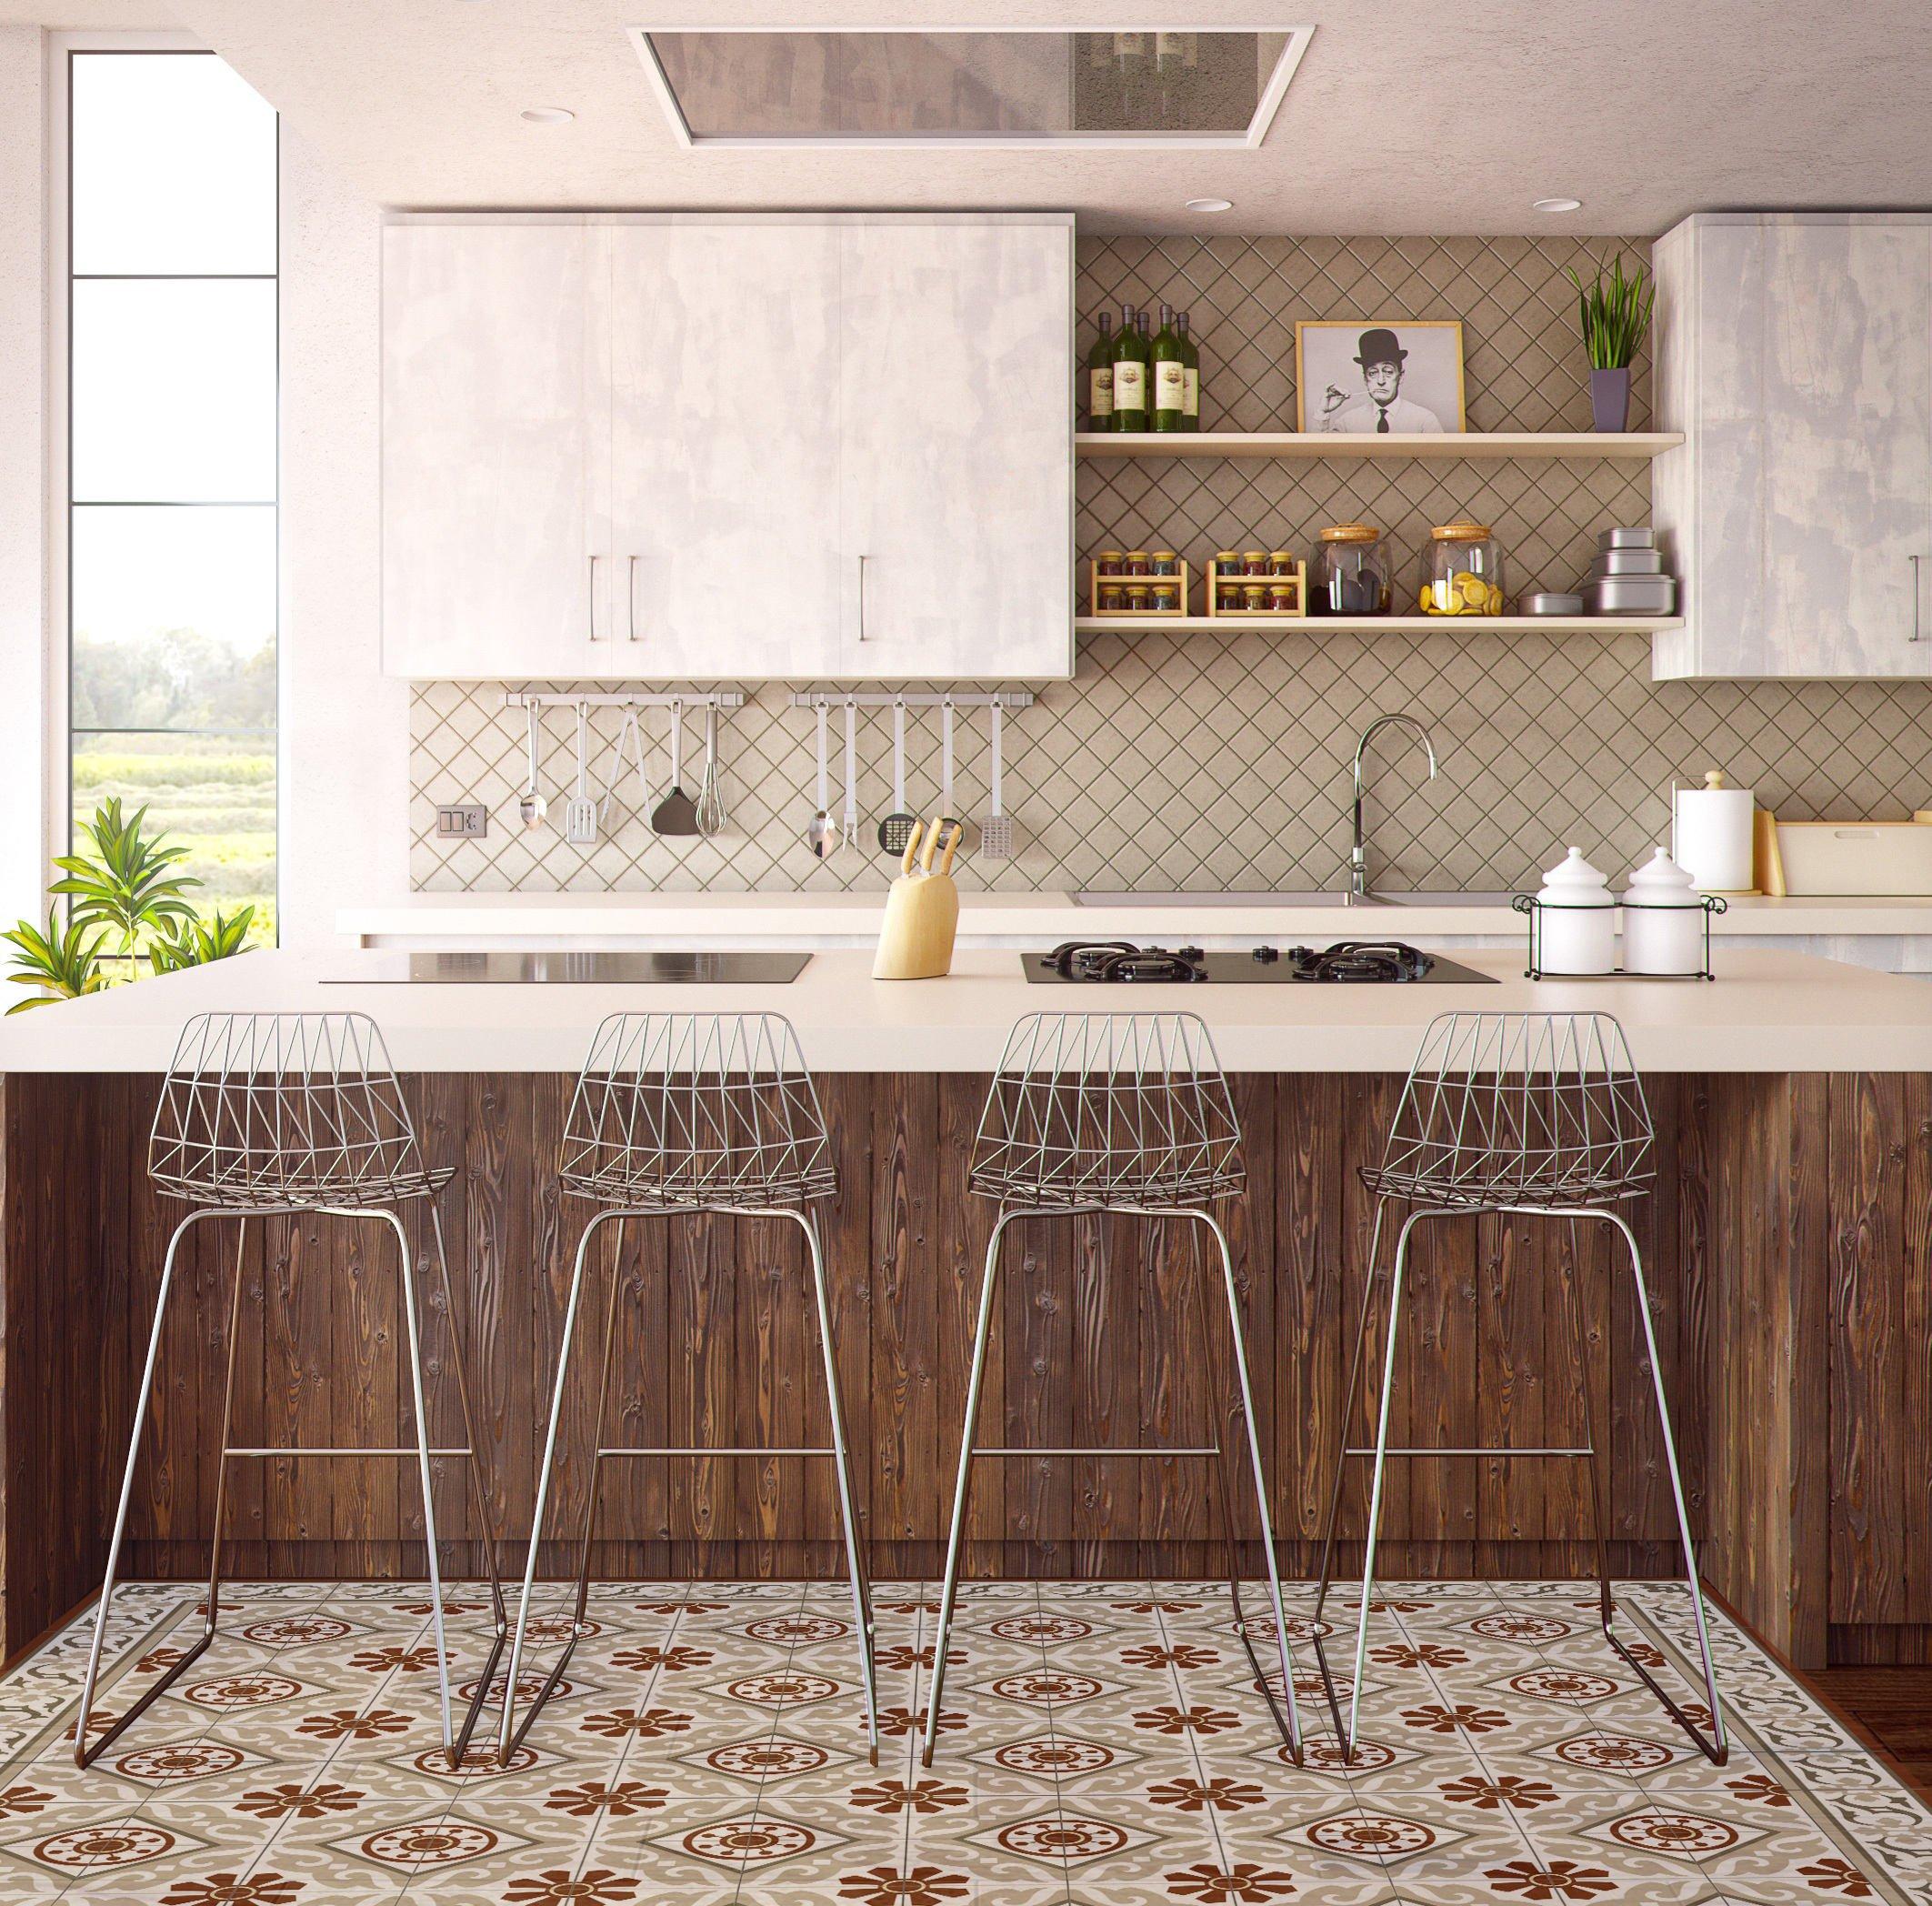 Home Decorative Tiles